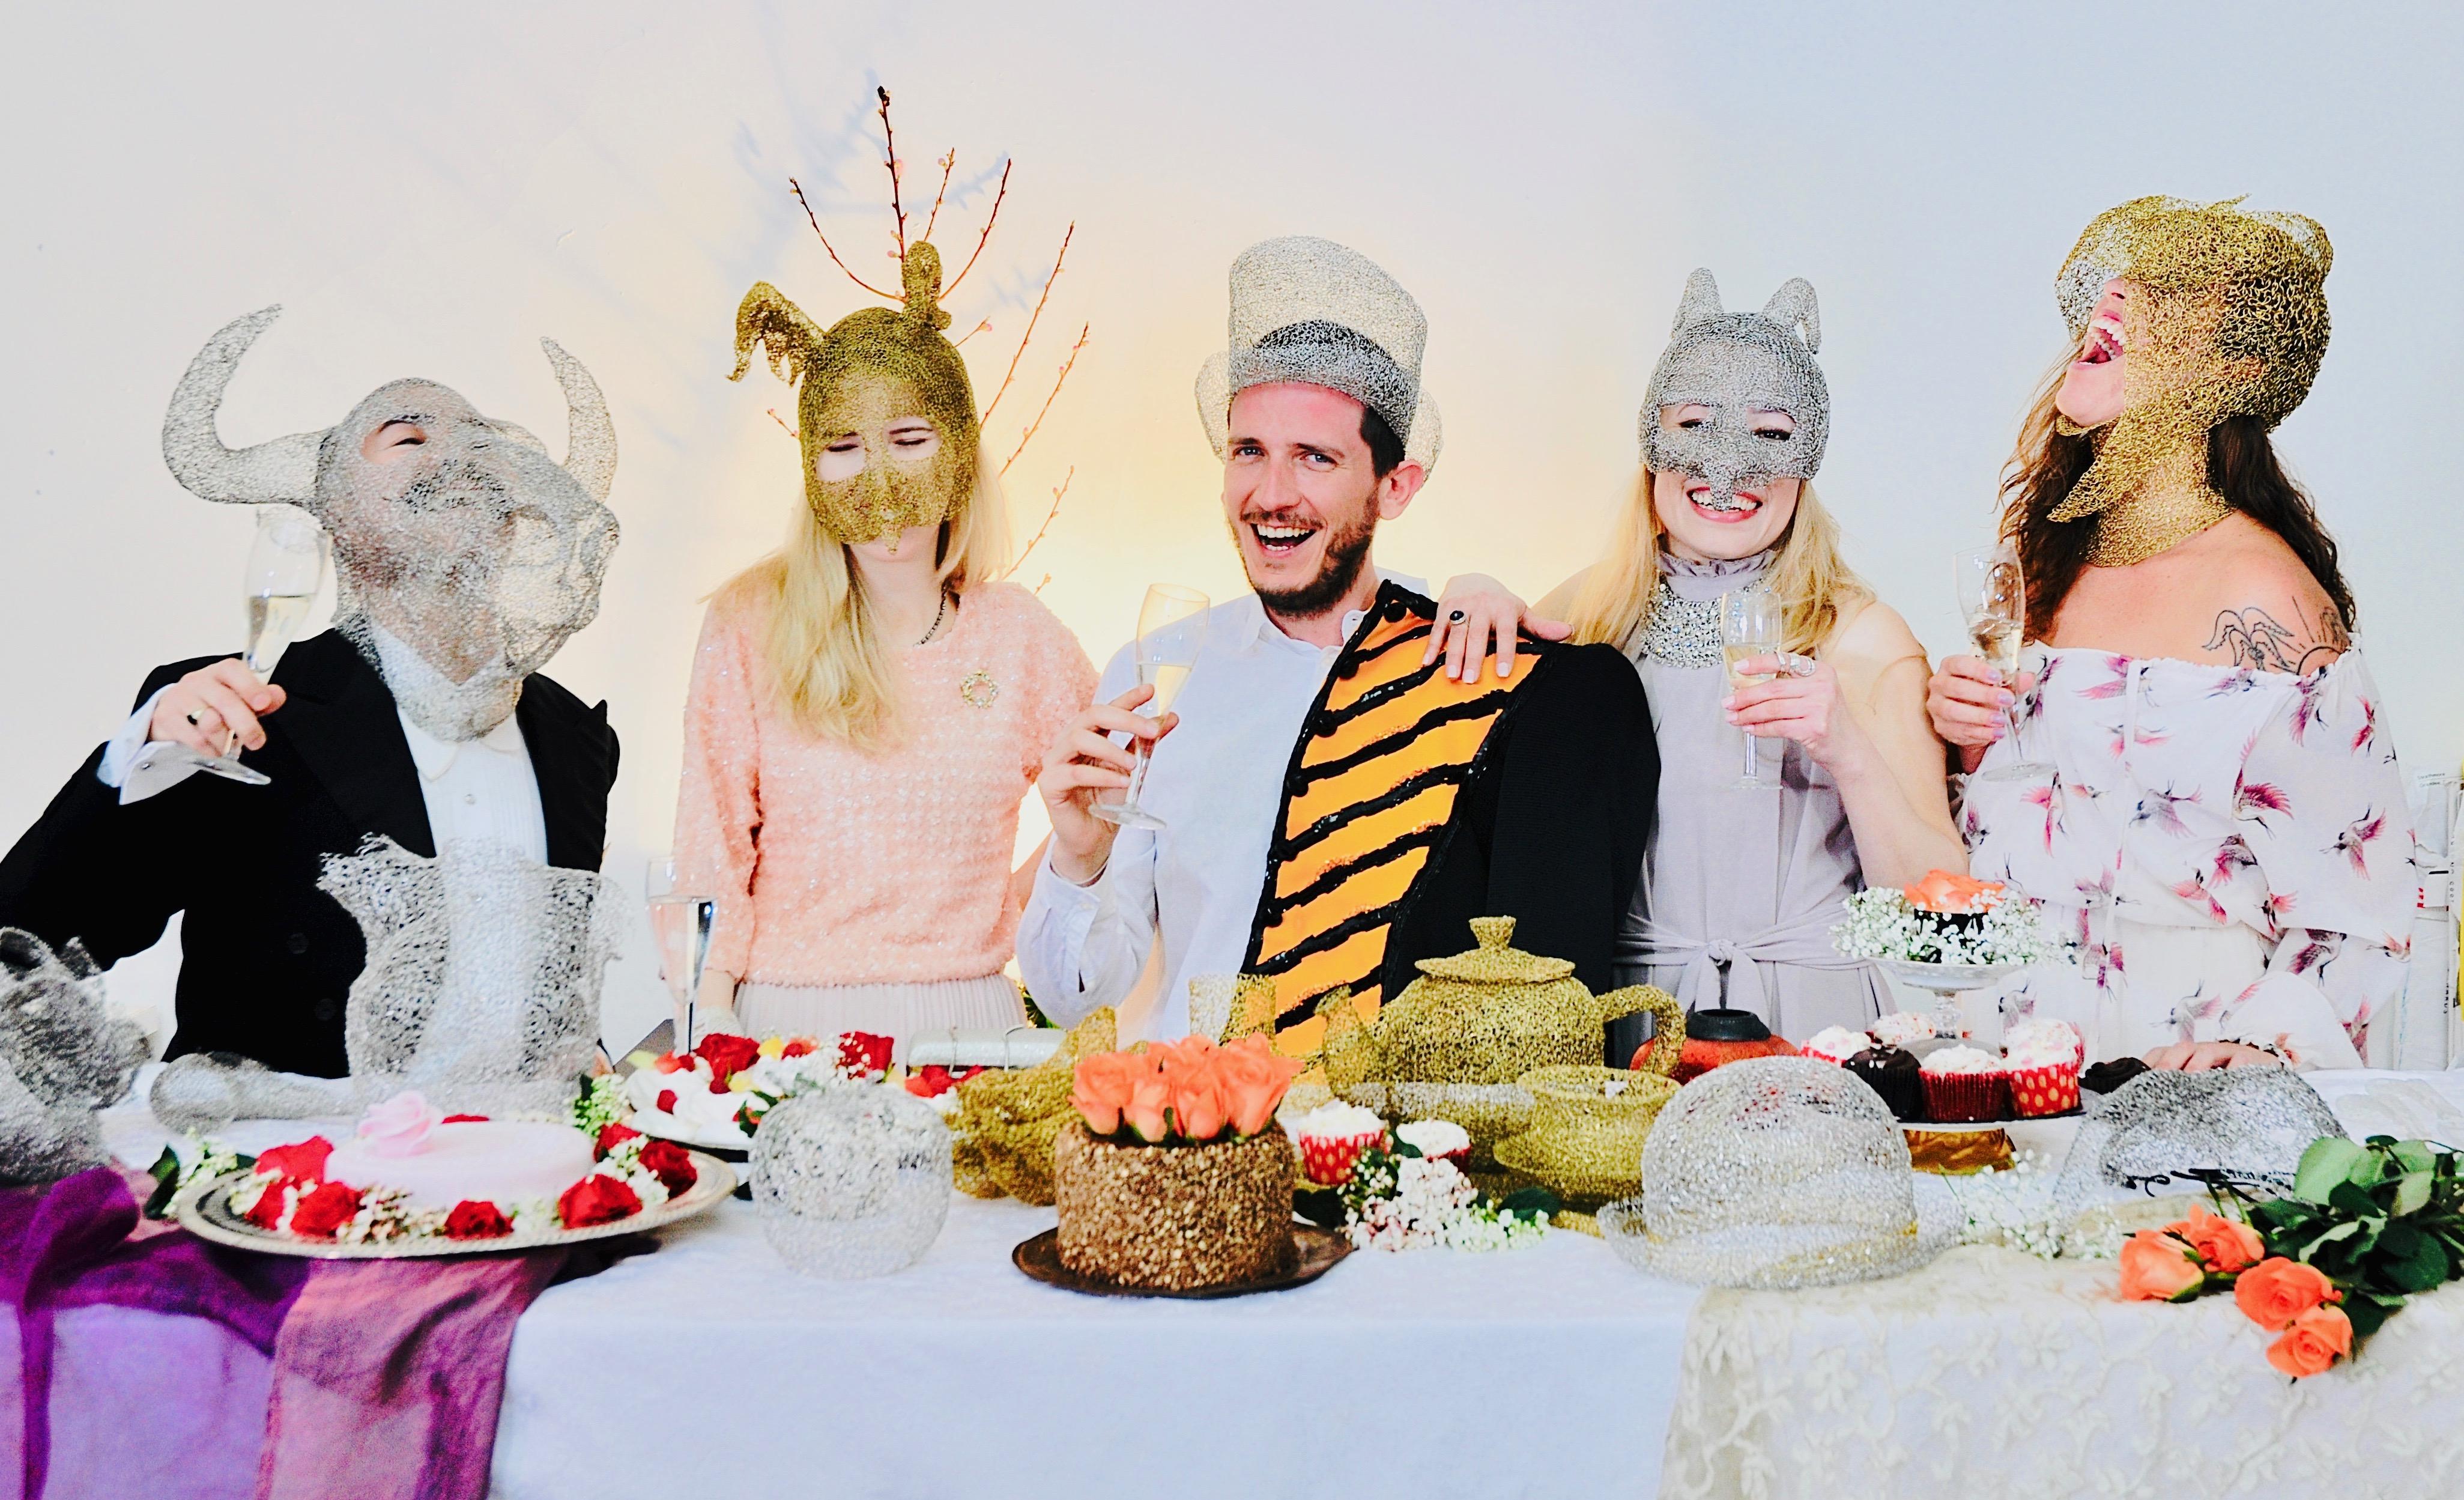 artist art cake party